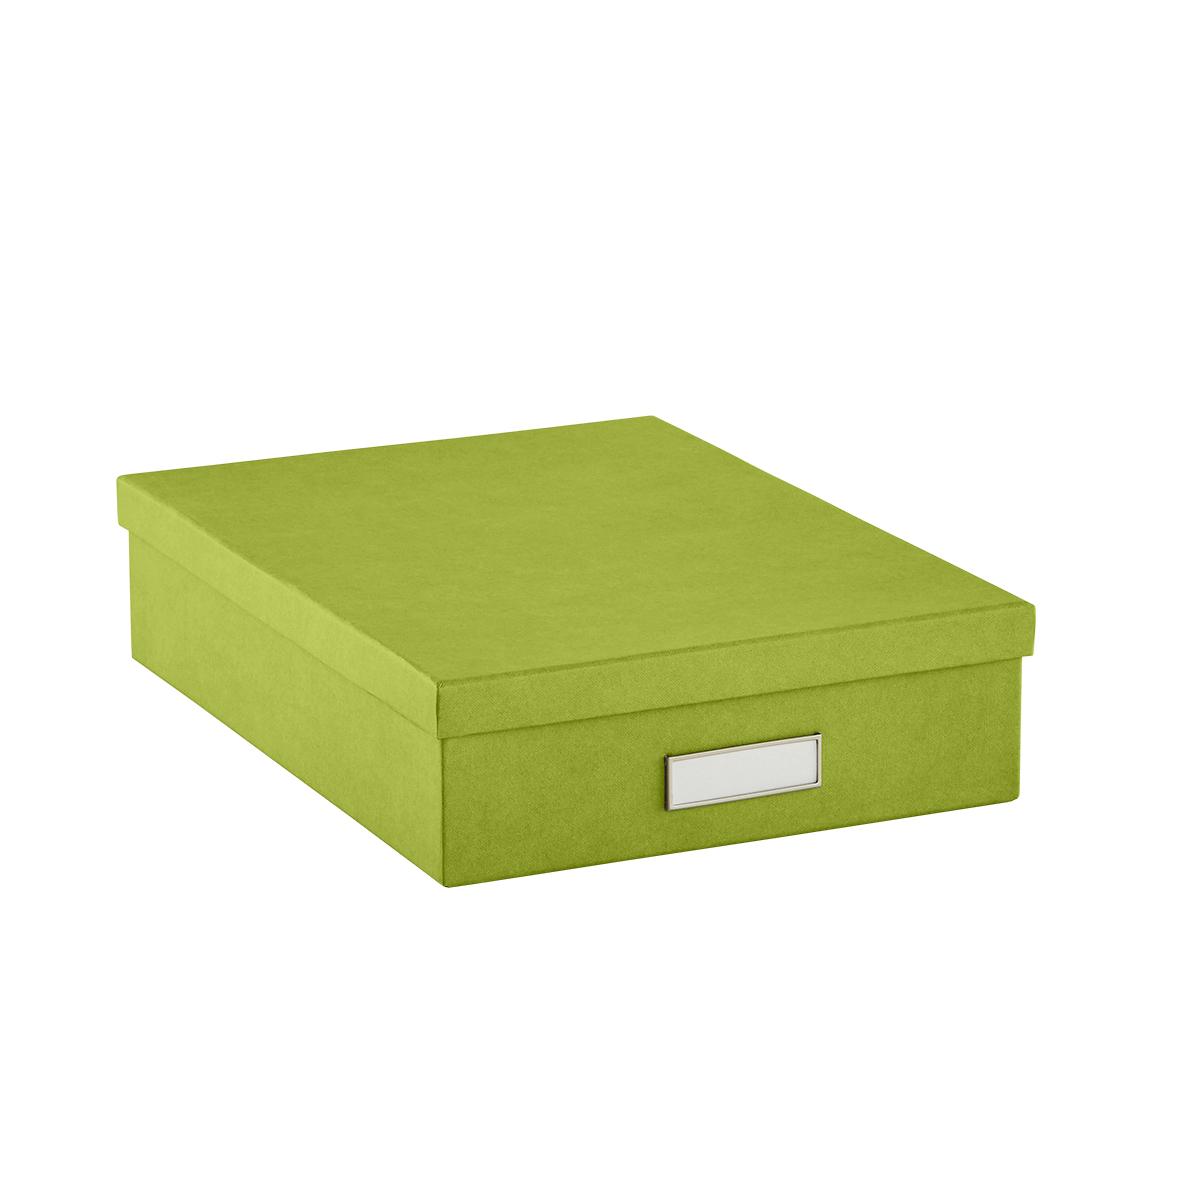 Stockholm Letter Box